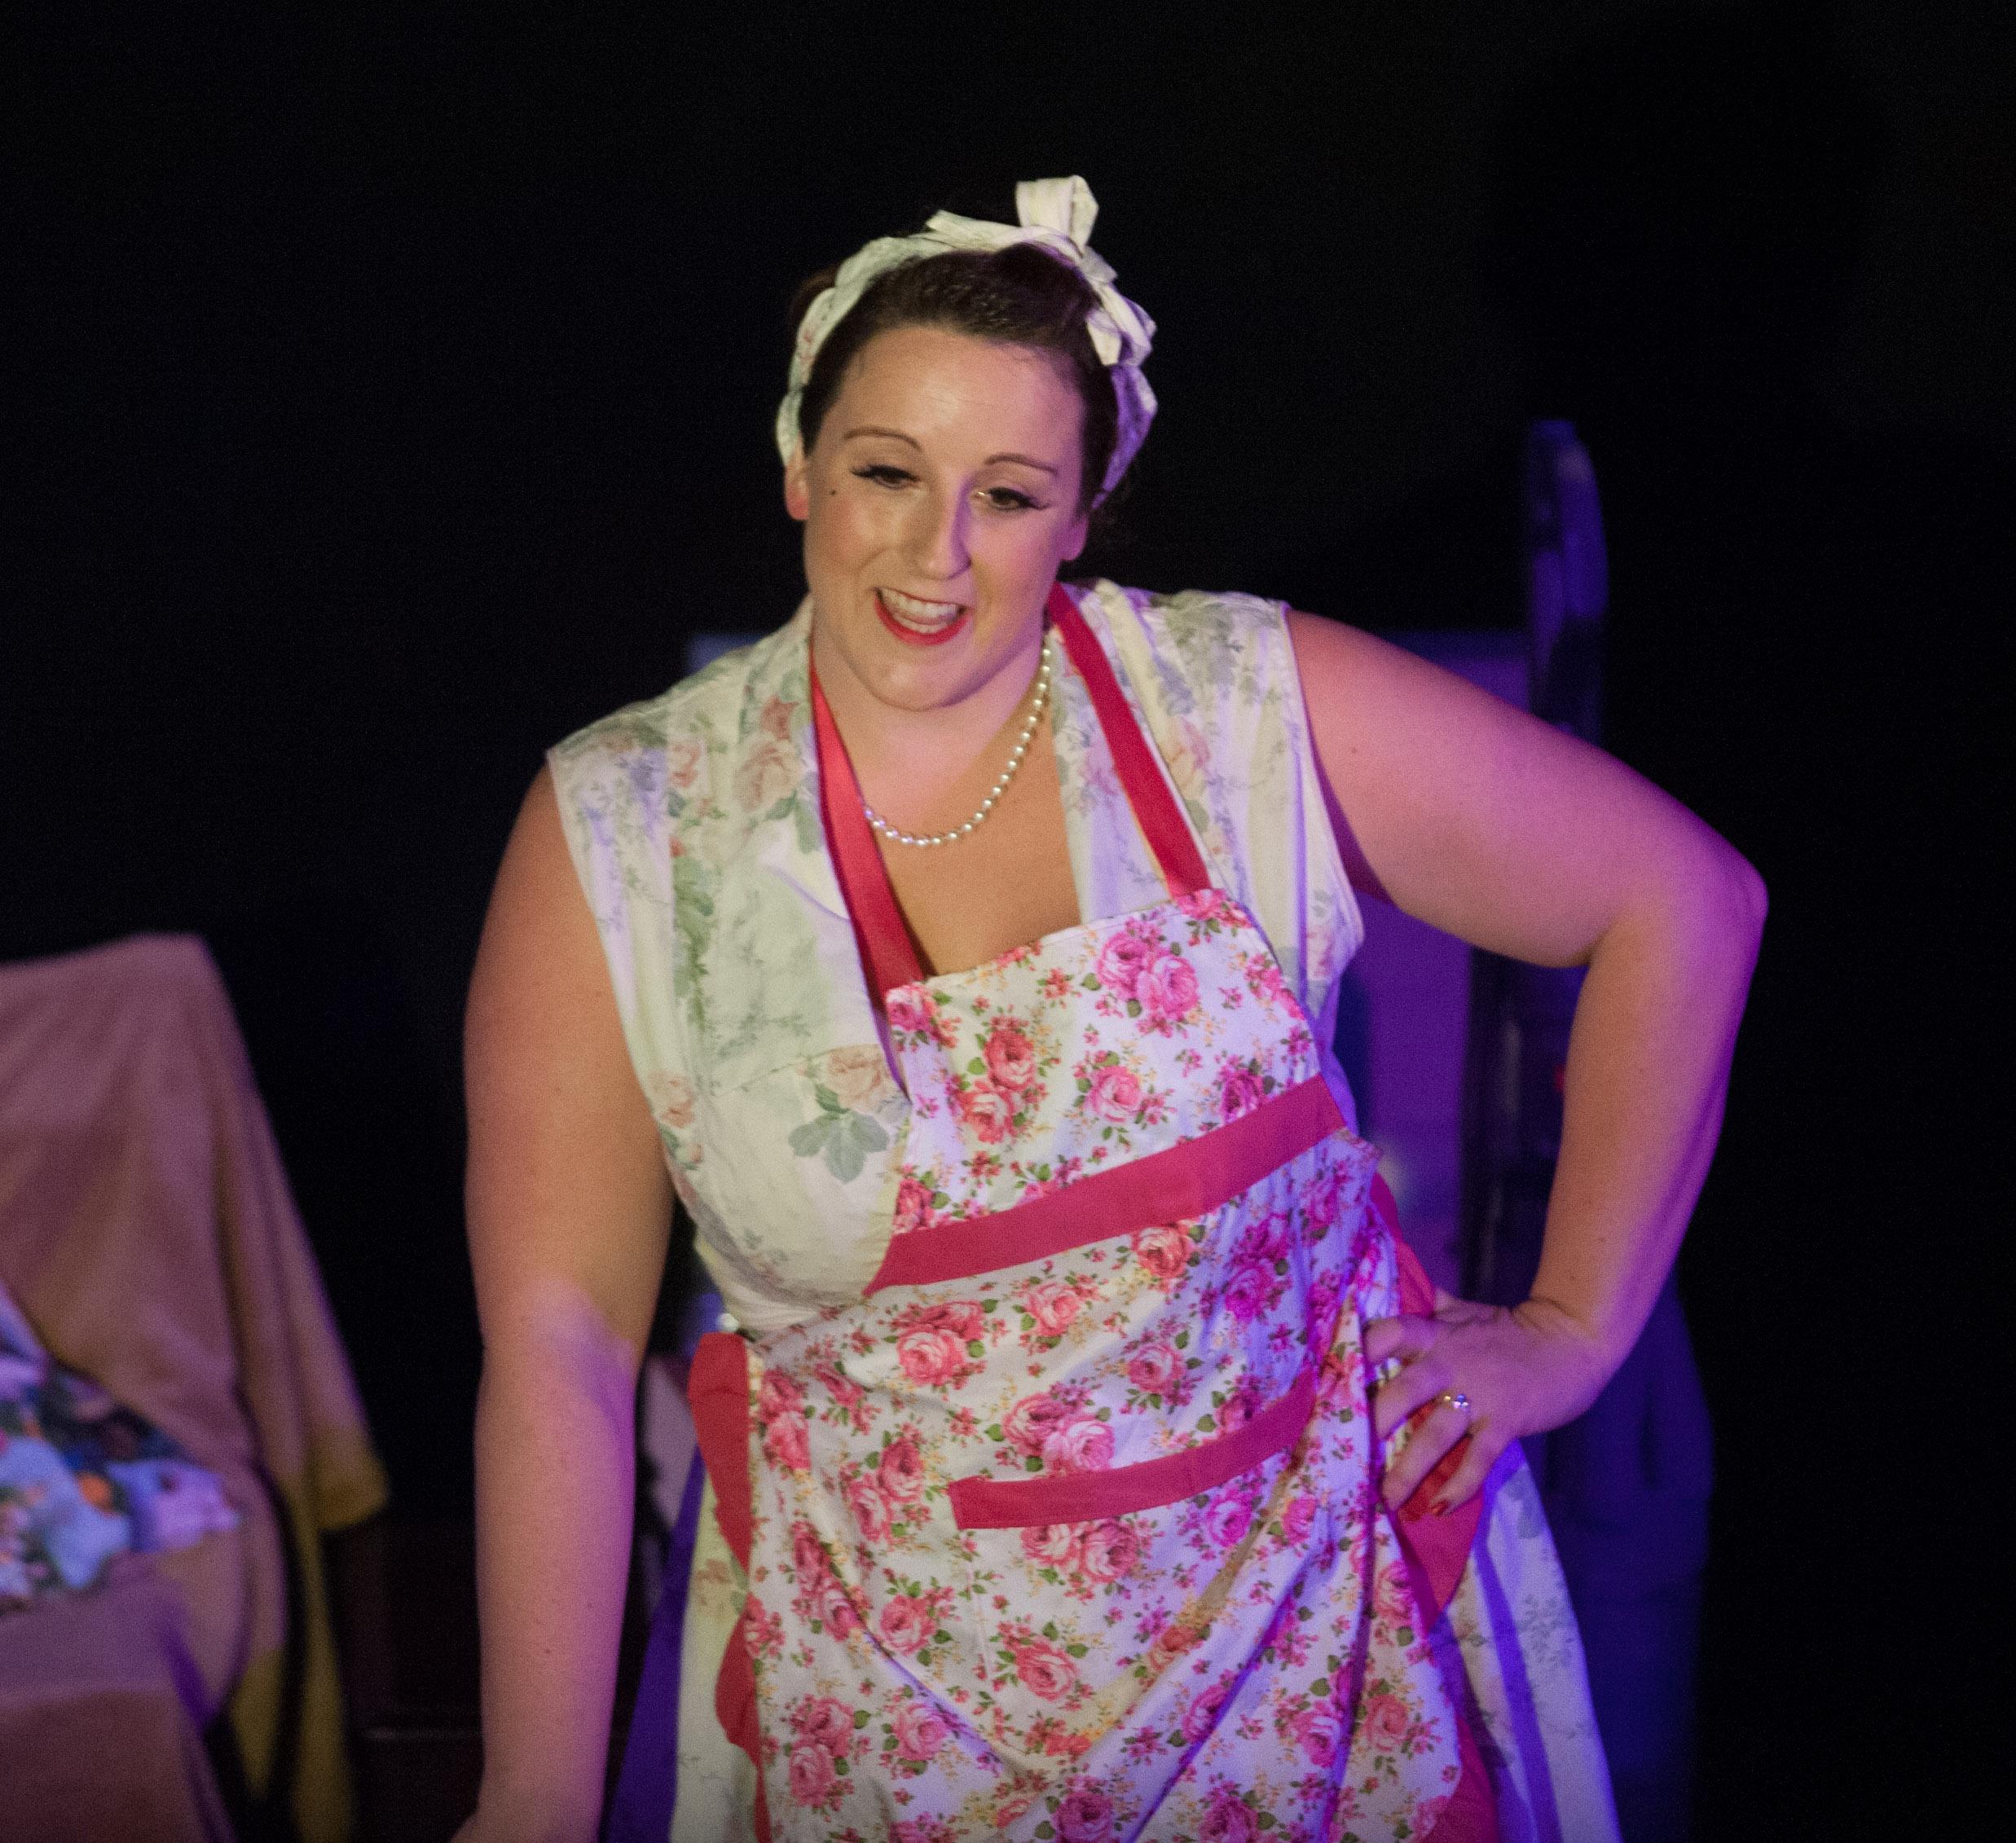 Suburbaret 1: Jessa Belle